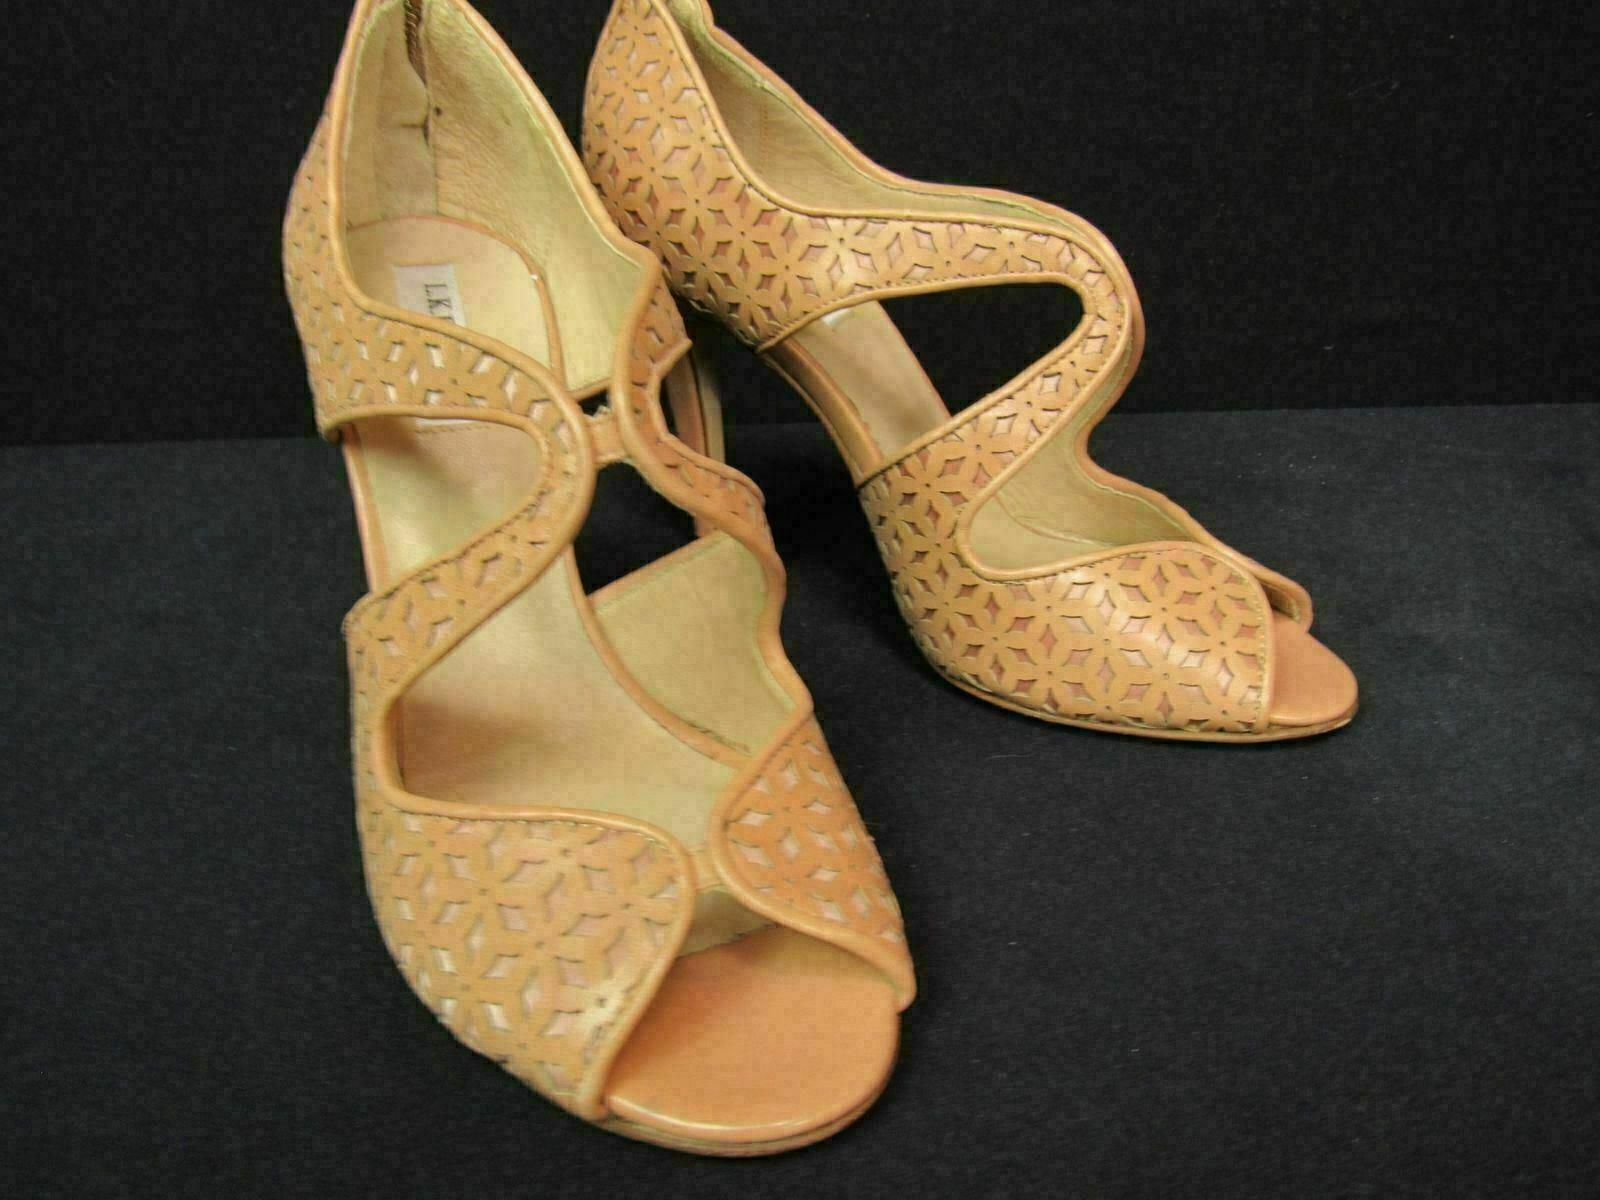 LK Bennett Malibu bluesh Leather Peep Toe Heel Sandals Size 39 9  475